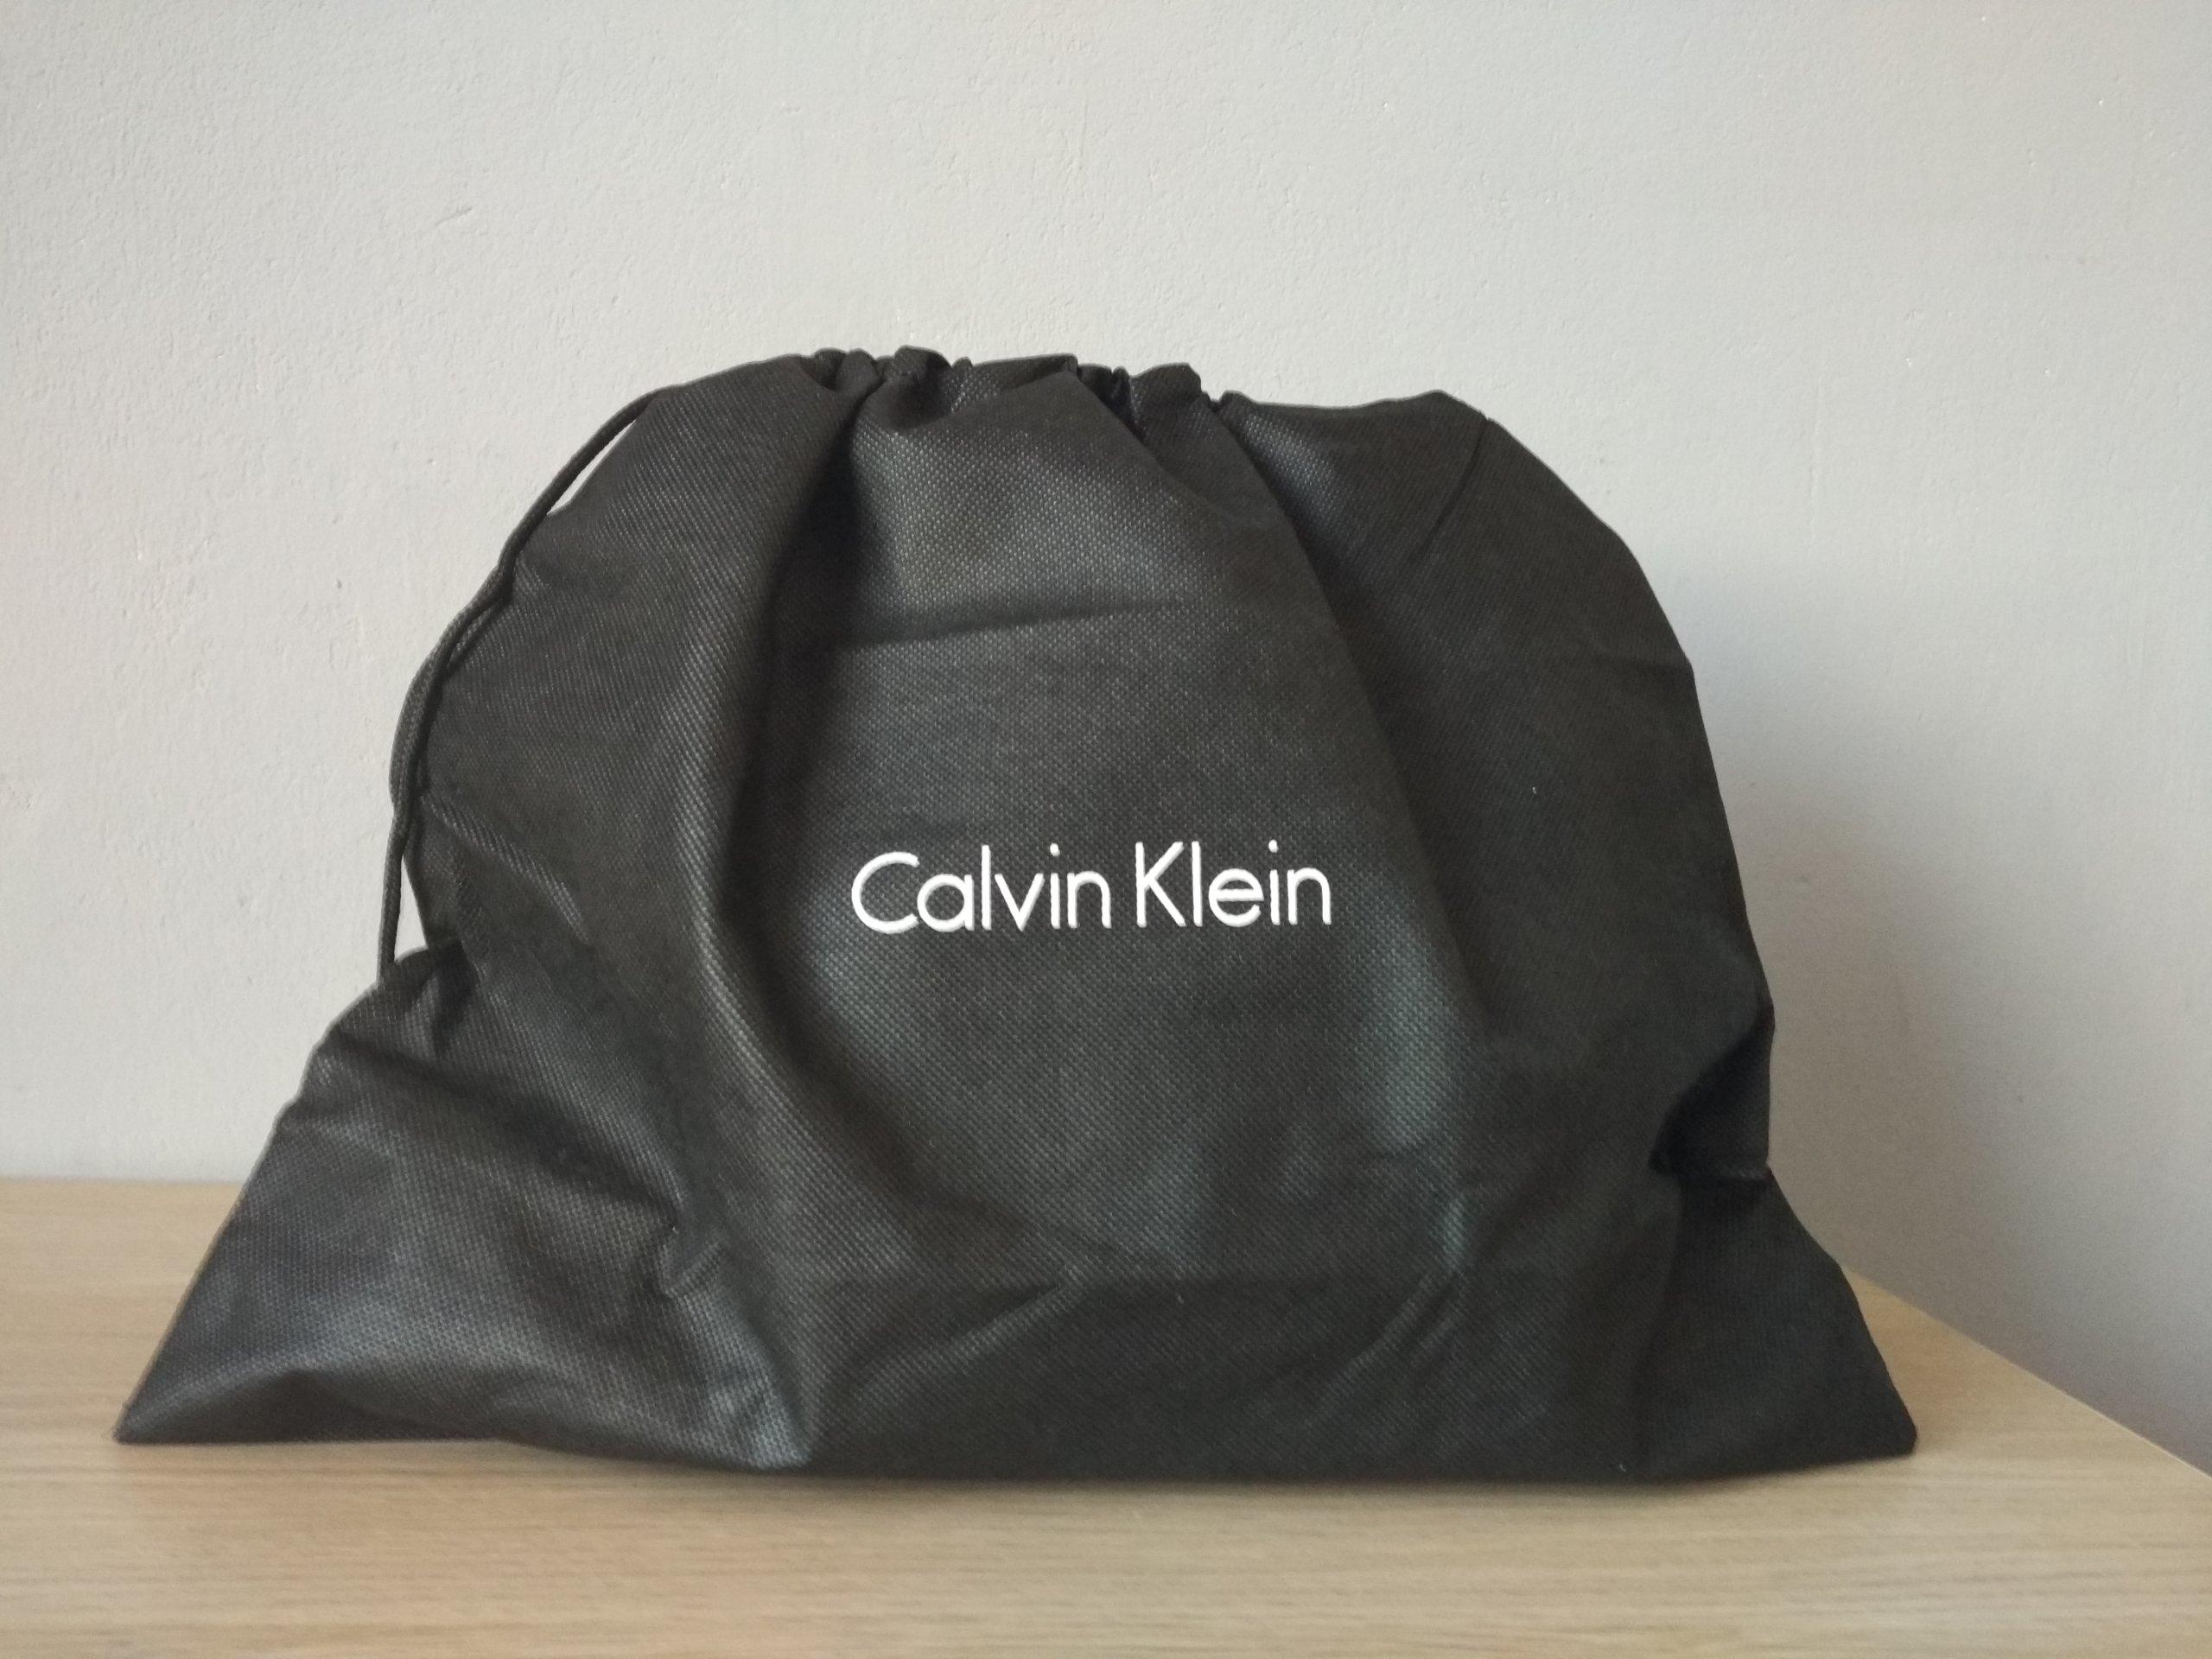 25096d281c4f2 Czarna Nowa Torebka Calvin Klein Zalando Oryginał - 7248394995 ...